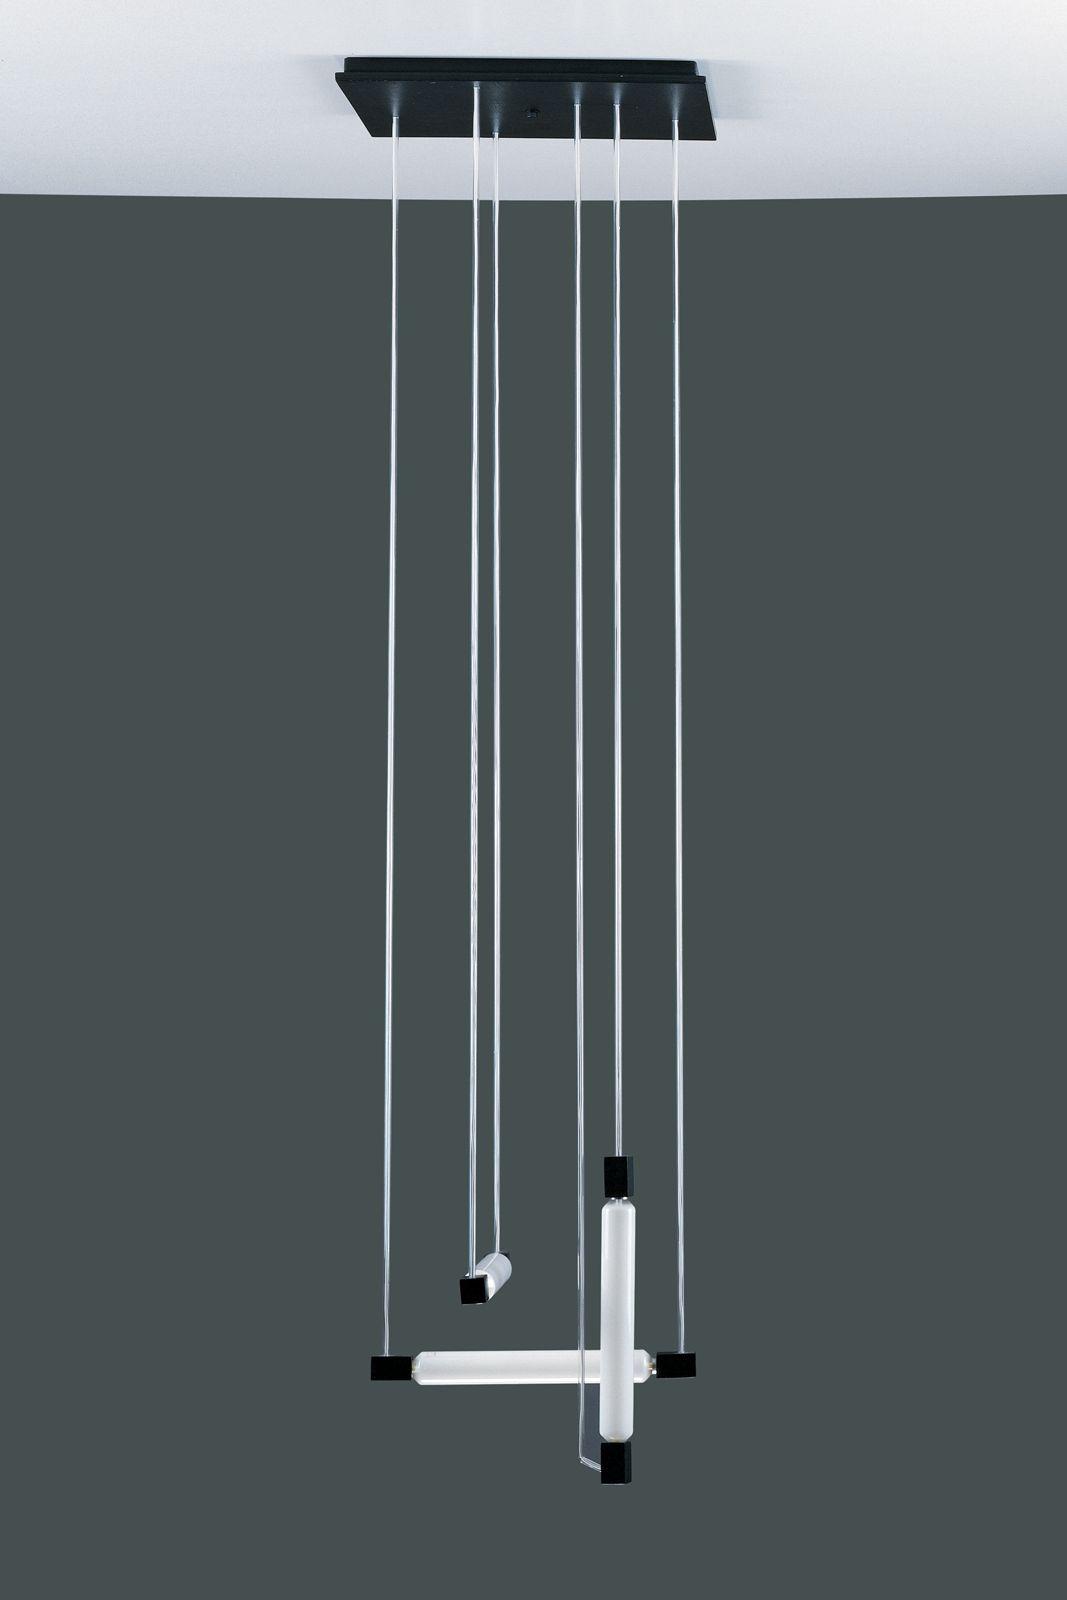 corning museum of glass hanging lamp designed by gerrit. Black Bedroom Furniture Sets. Home Design Ideas